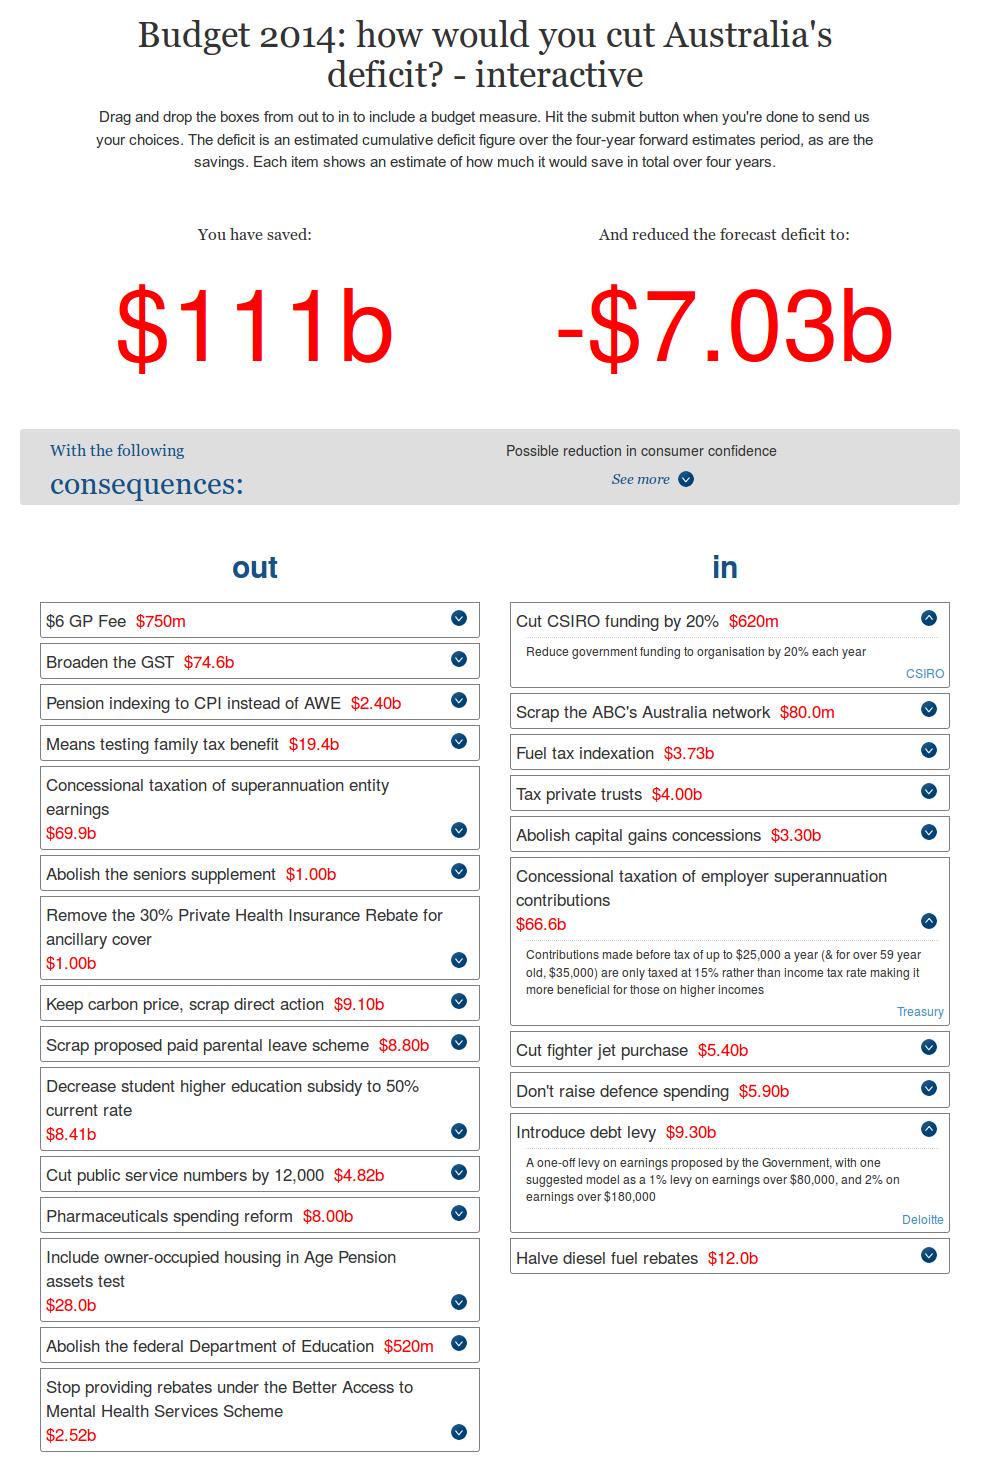 Budget 2014: how would you cut Australia's deficit?